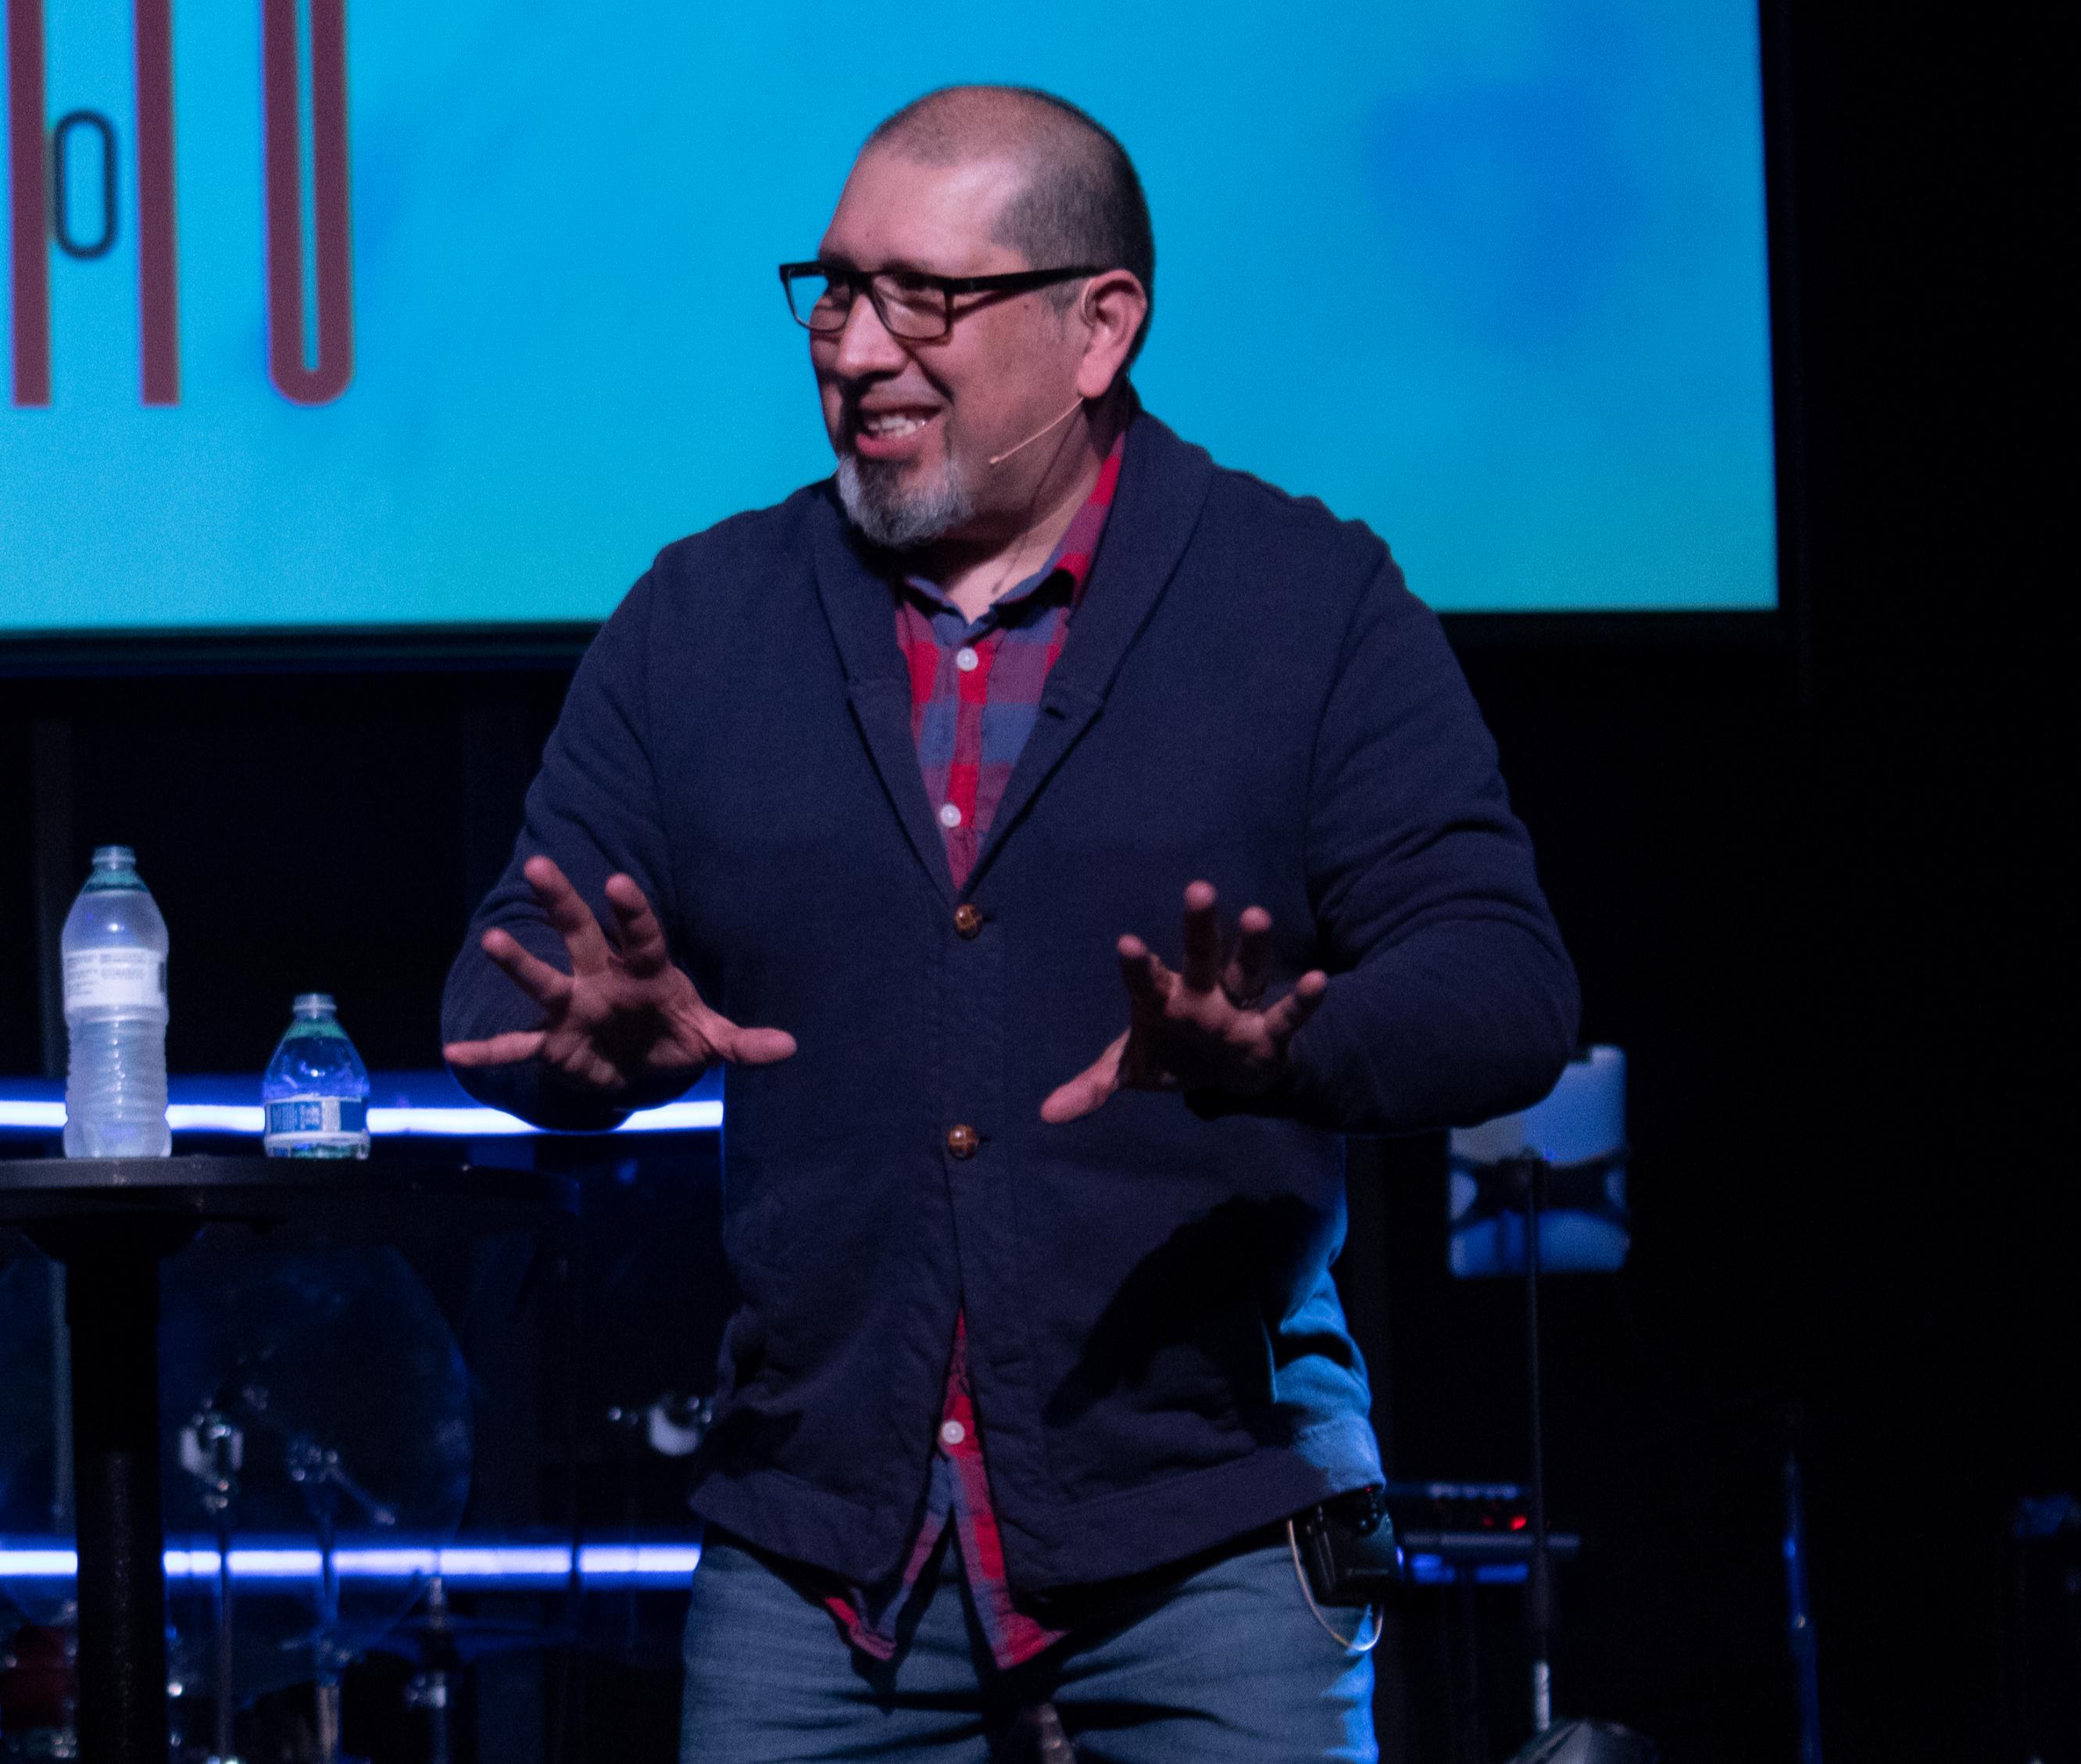 Pastor Ed Garcia